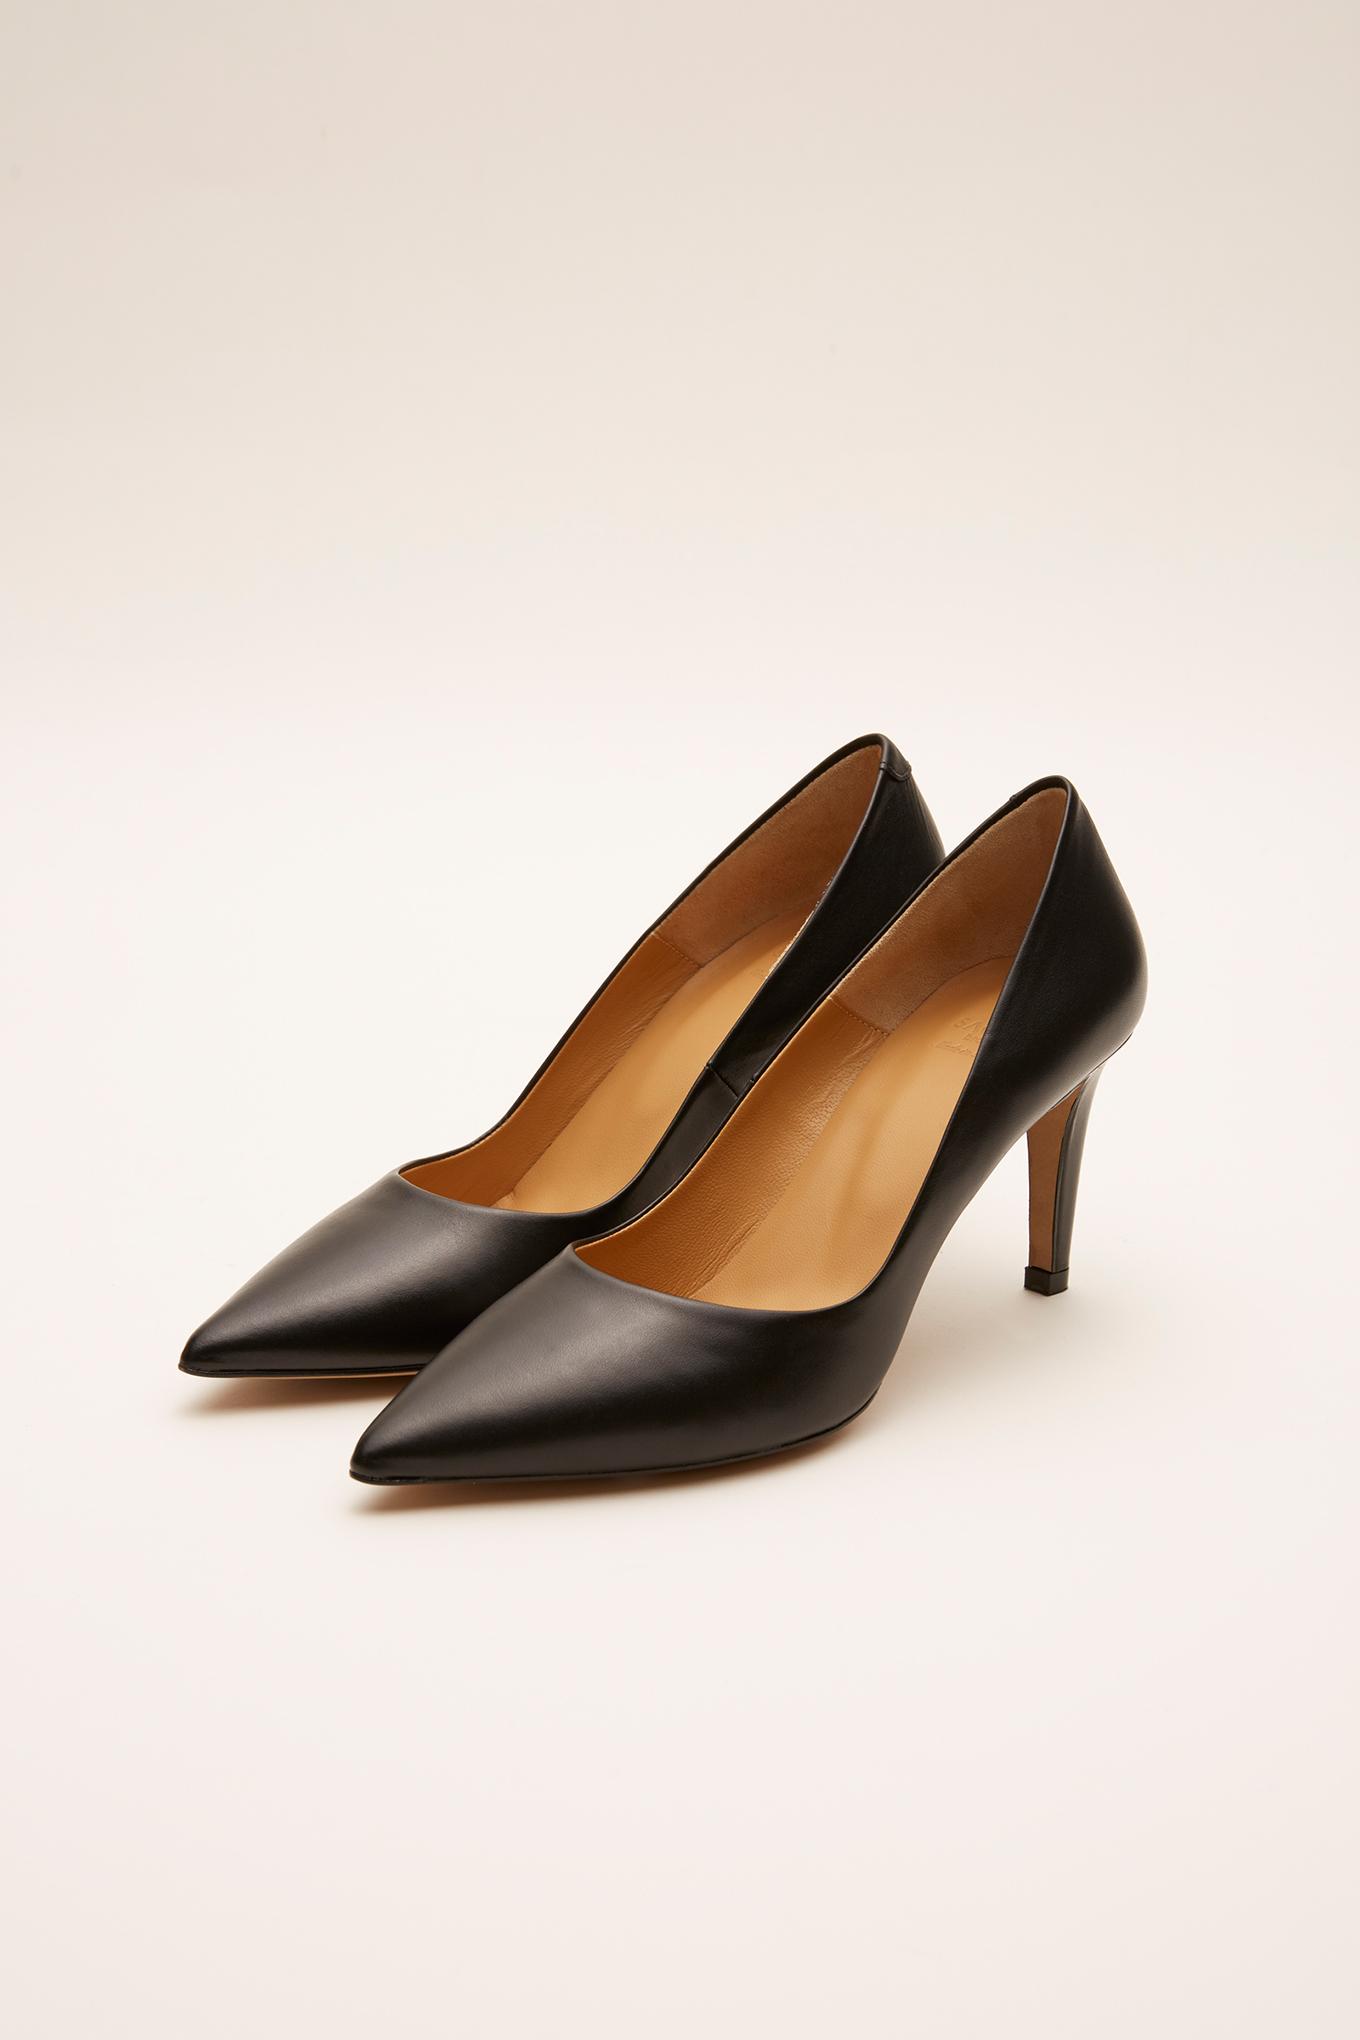 Shoes Black Classic Woman